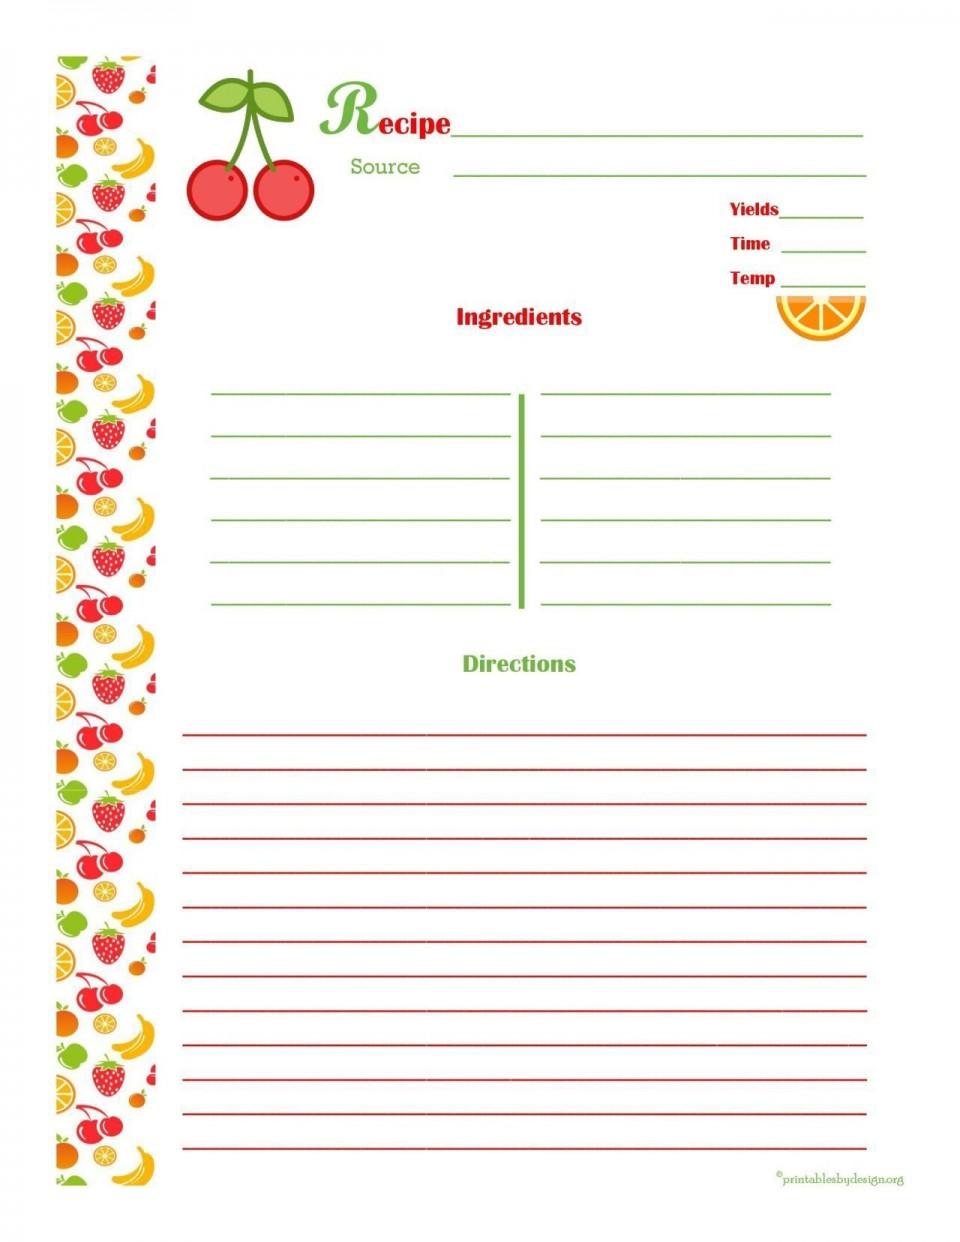 001 Striking 3 X 5 Recipe Card Template Microsoft Word Idea 960